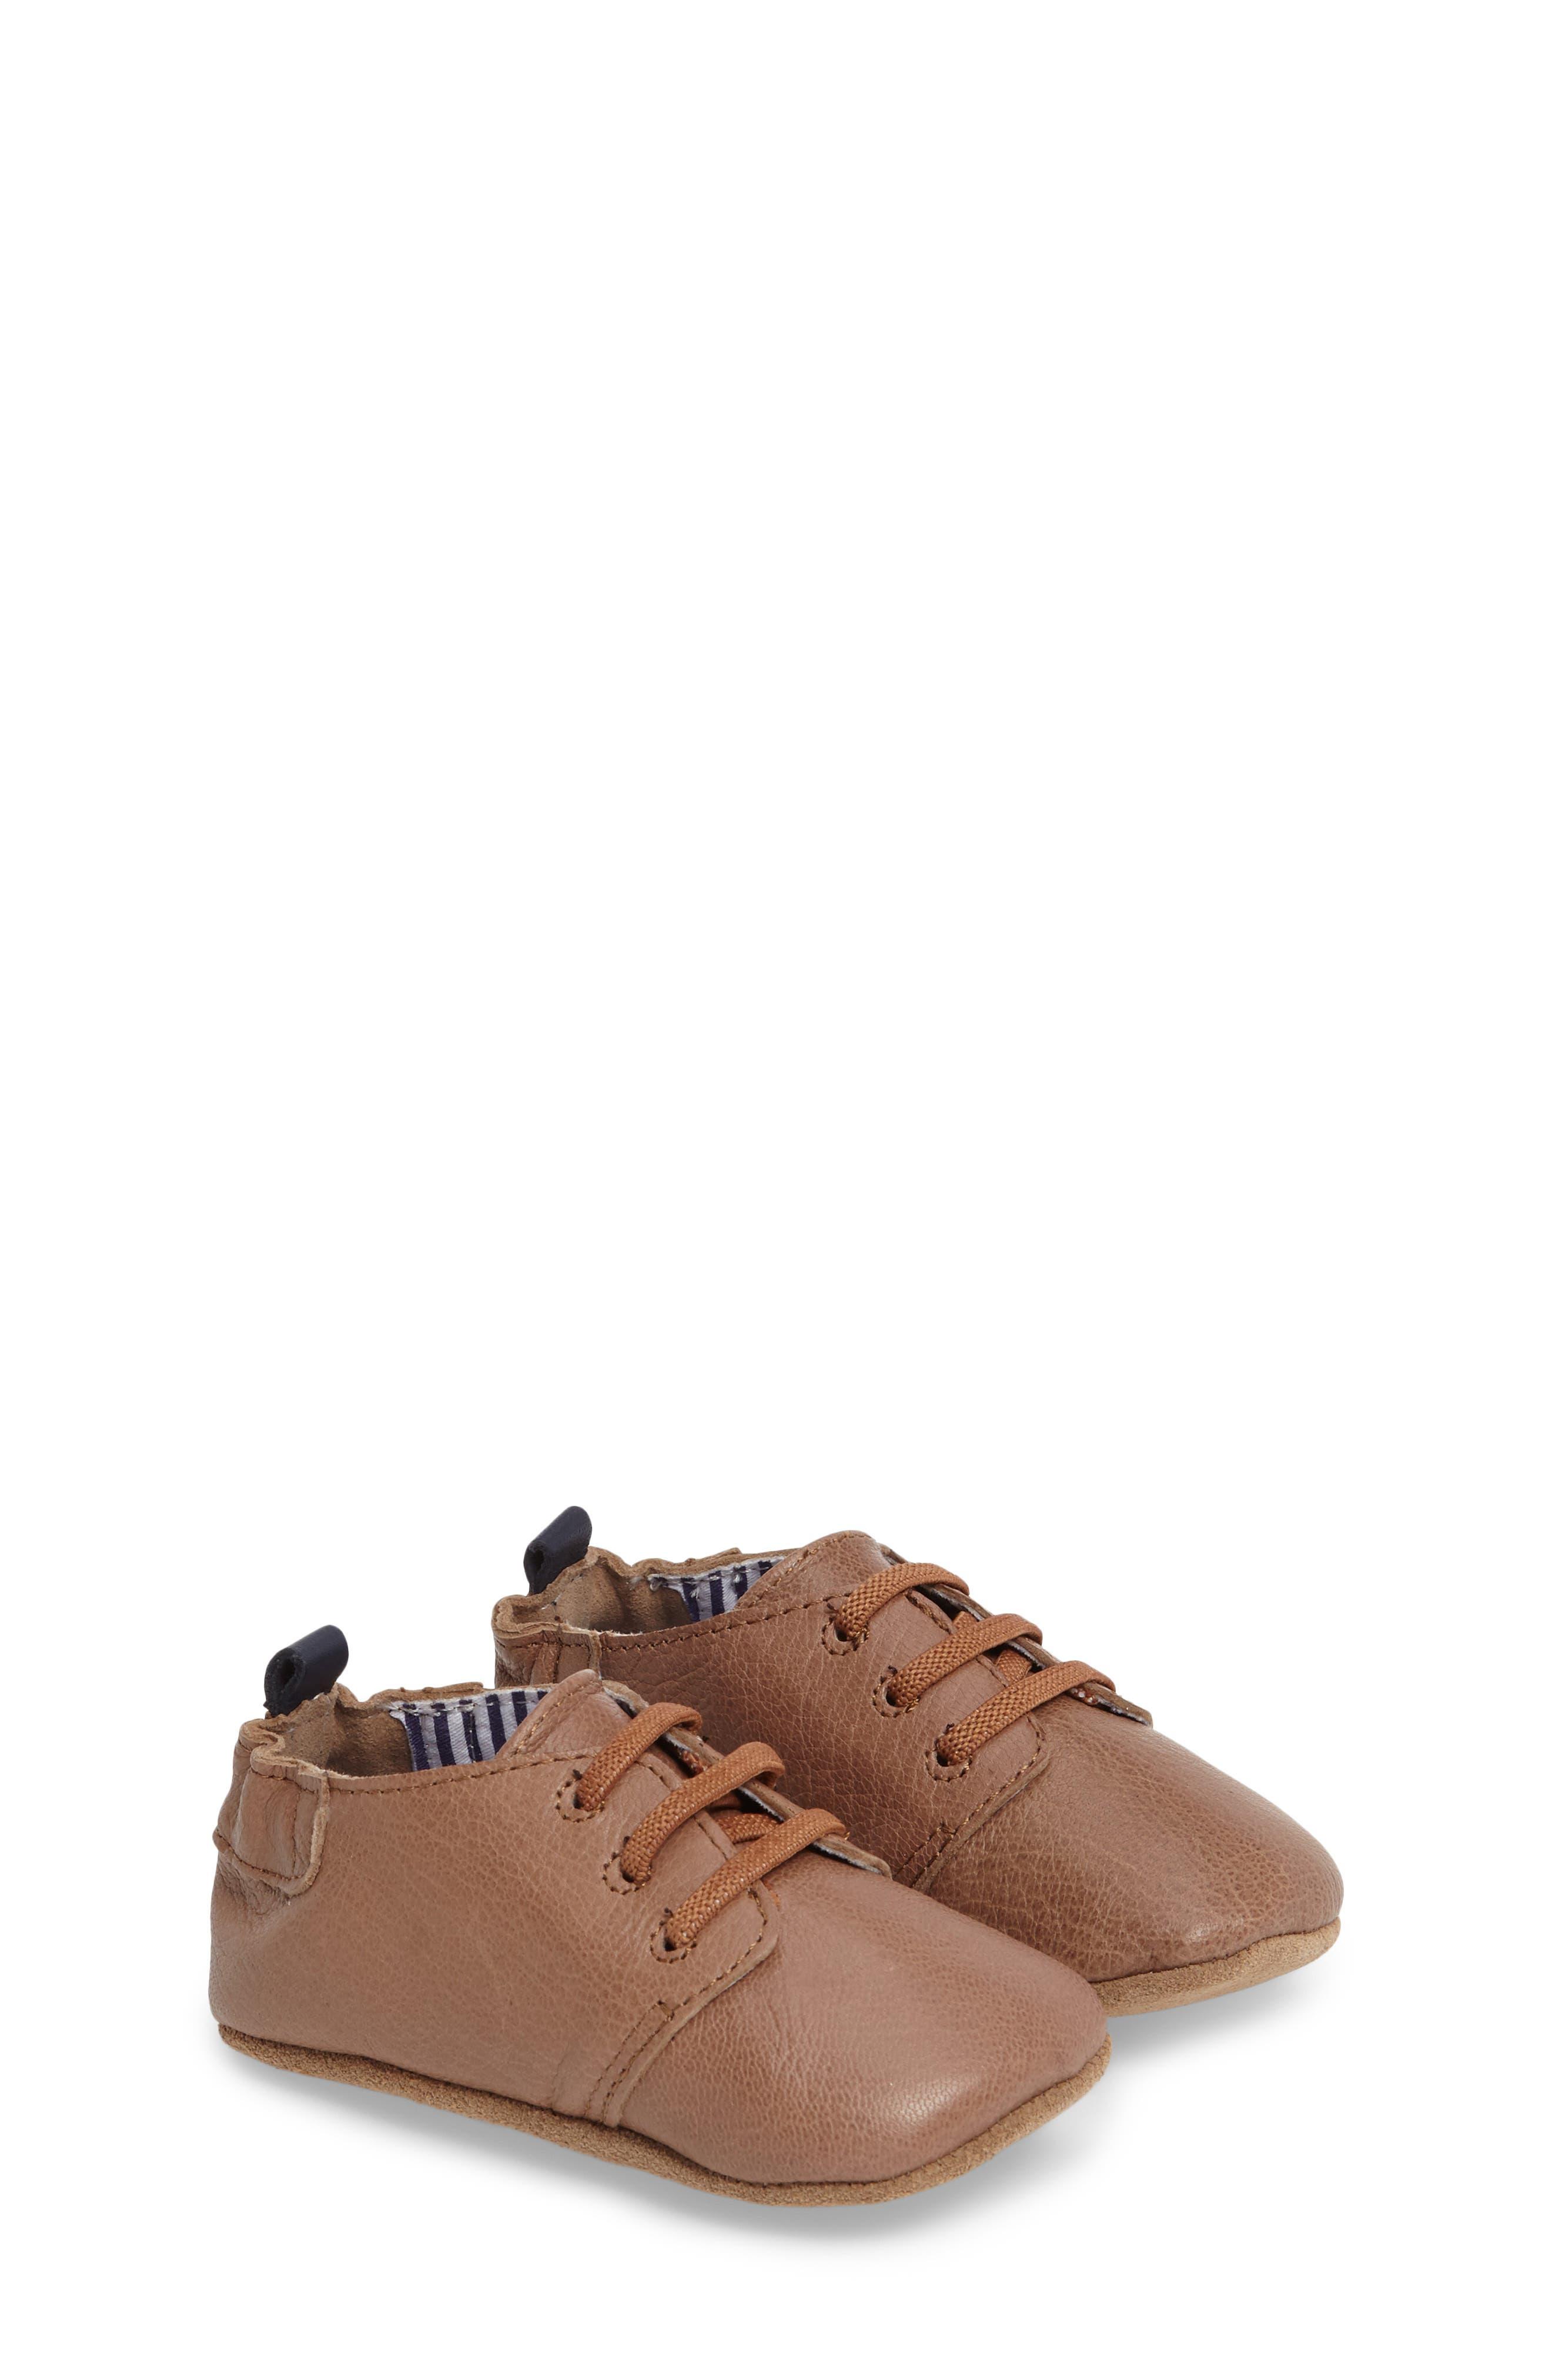 Owen Crib Shoe,                         Main,                         color, 200